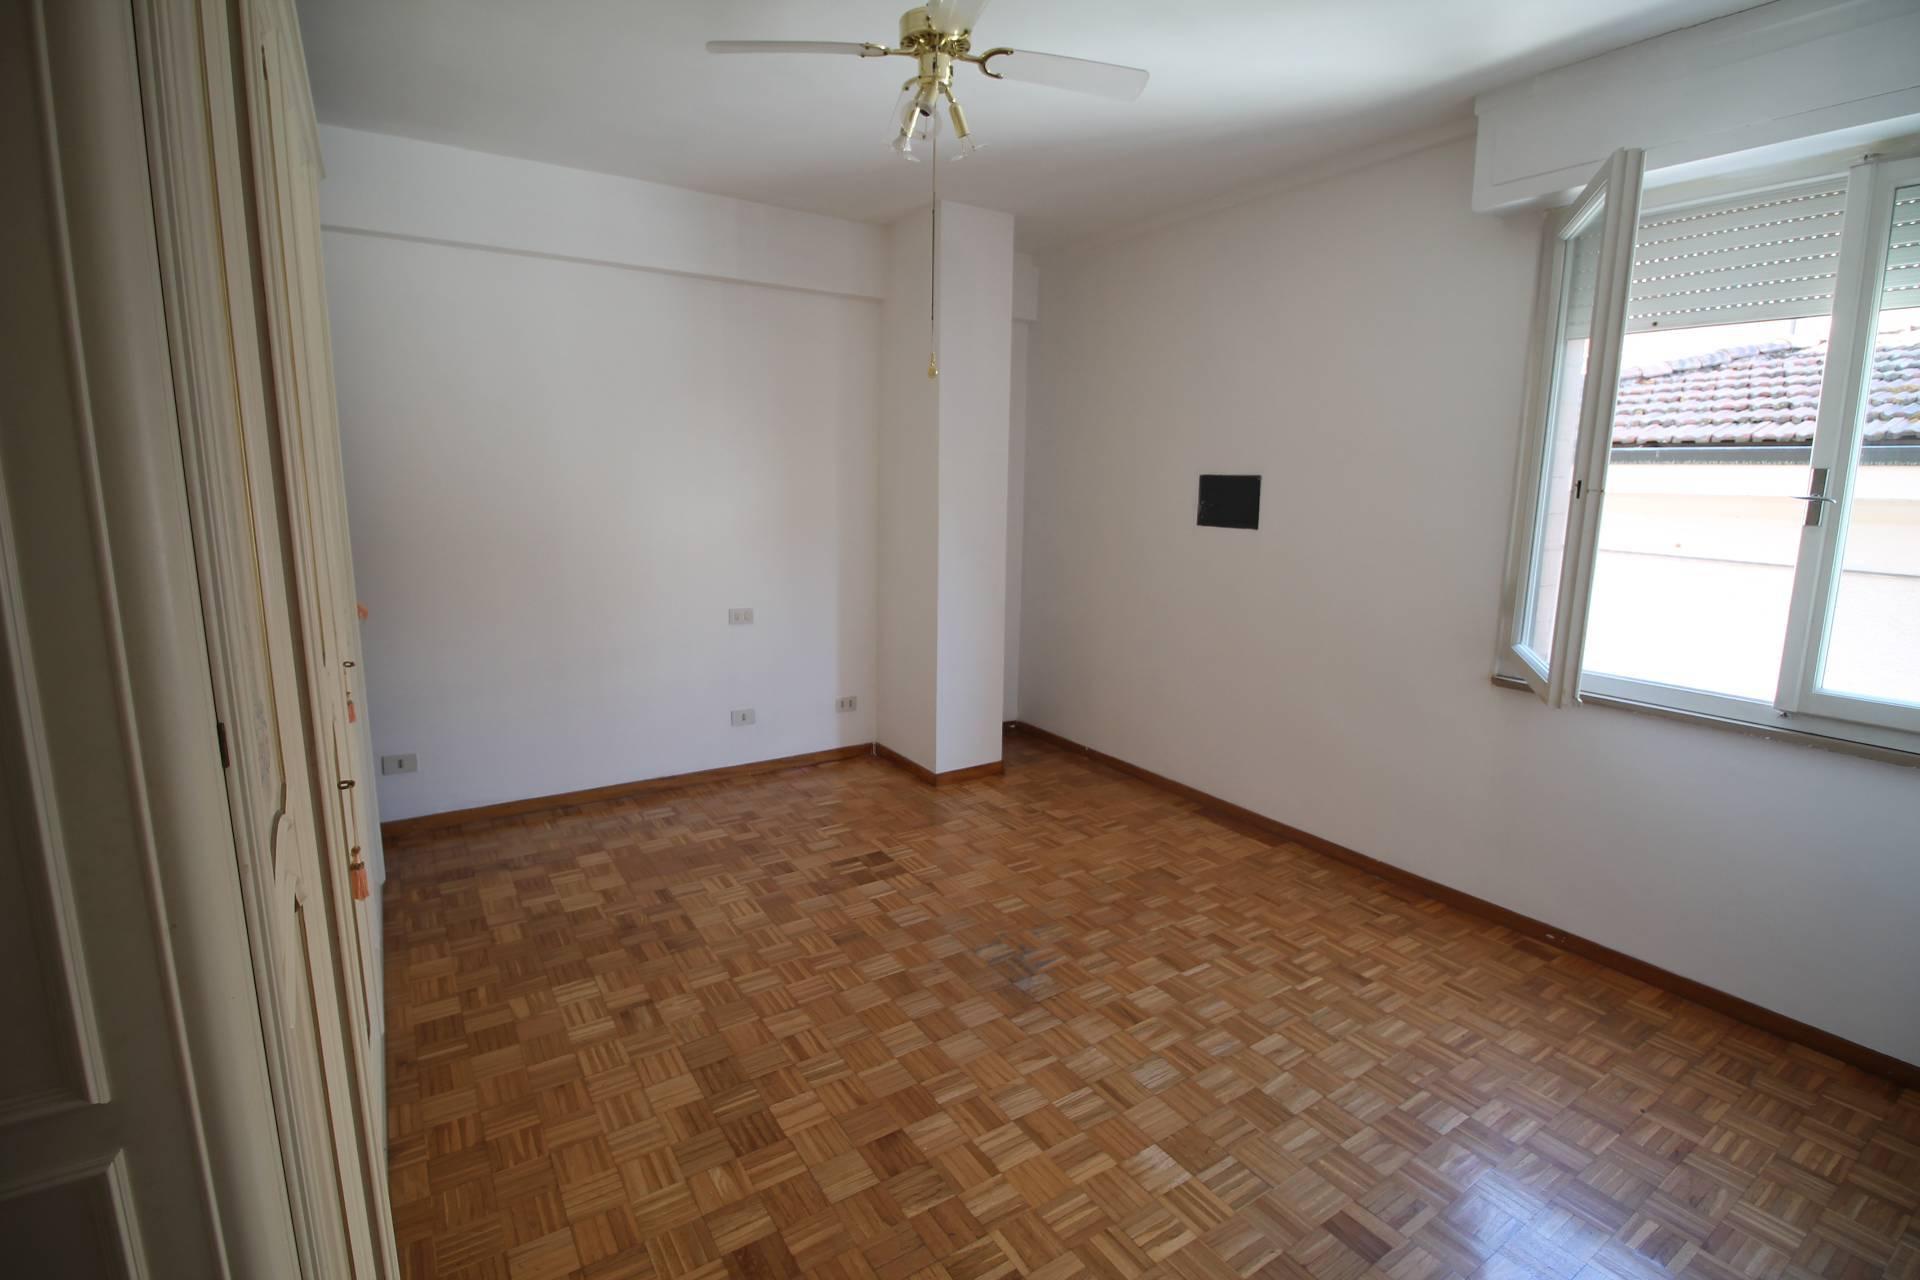 Appartamento in vendita, rif. V2792B